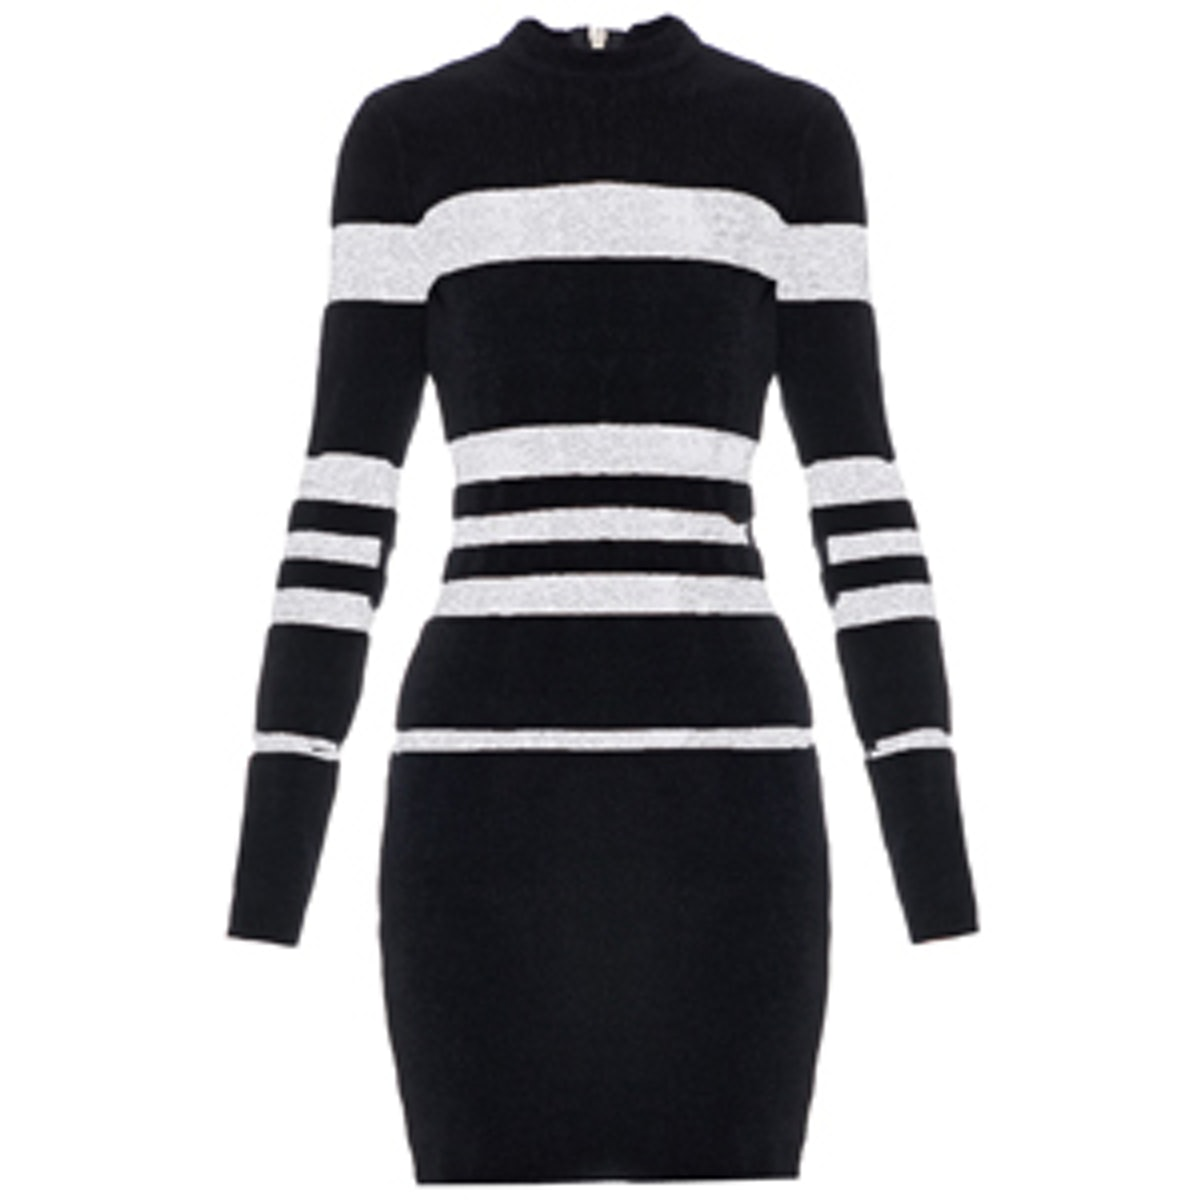 Long-Sleeved Striped Mini Dress